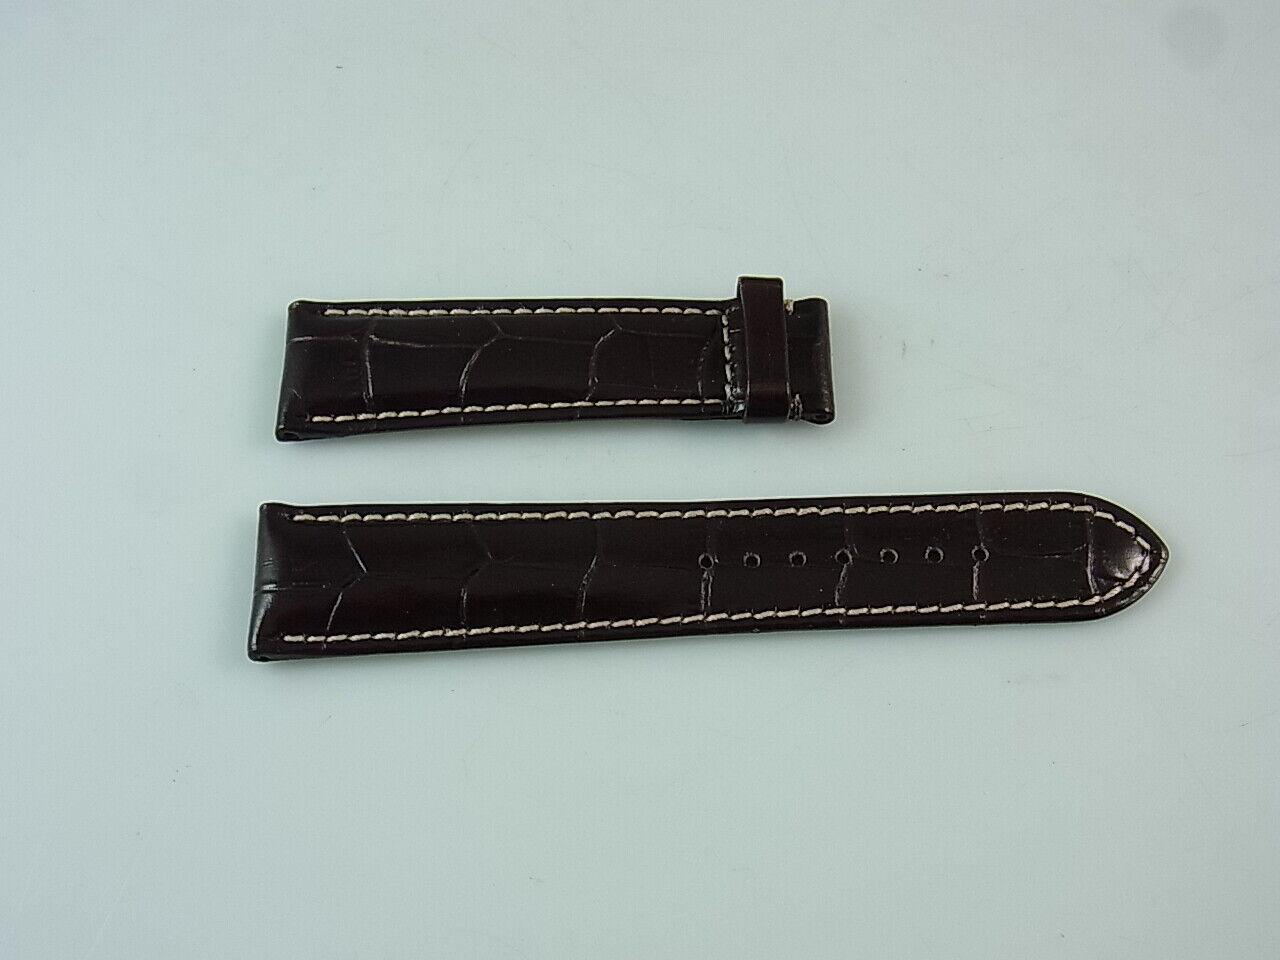 Union Glashütte Leder-Armband Uhren Ersatzband Ersatzarmband 21 mm Braun